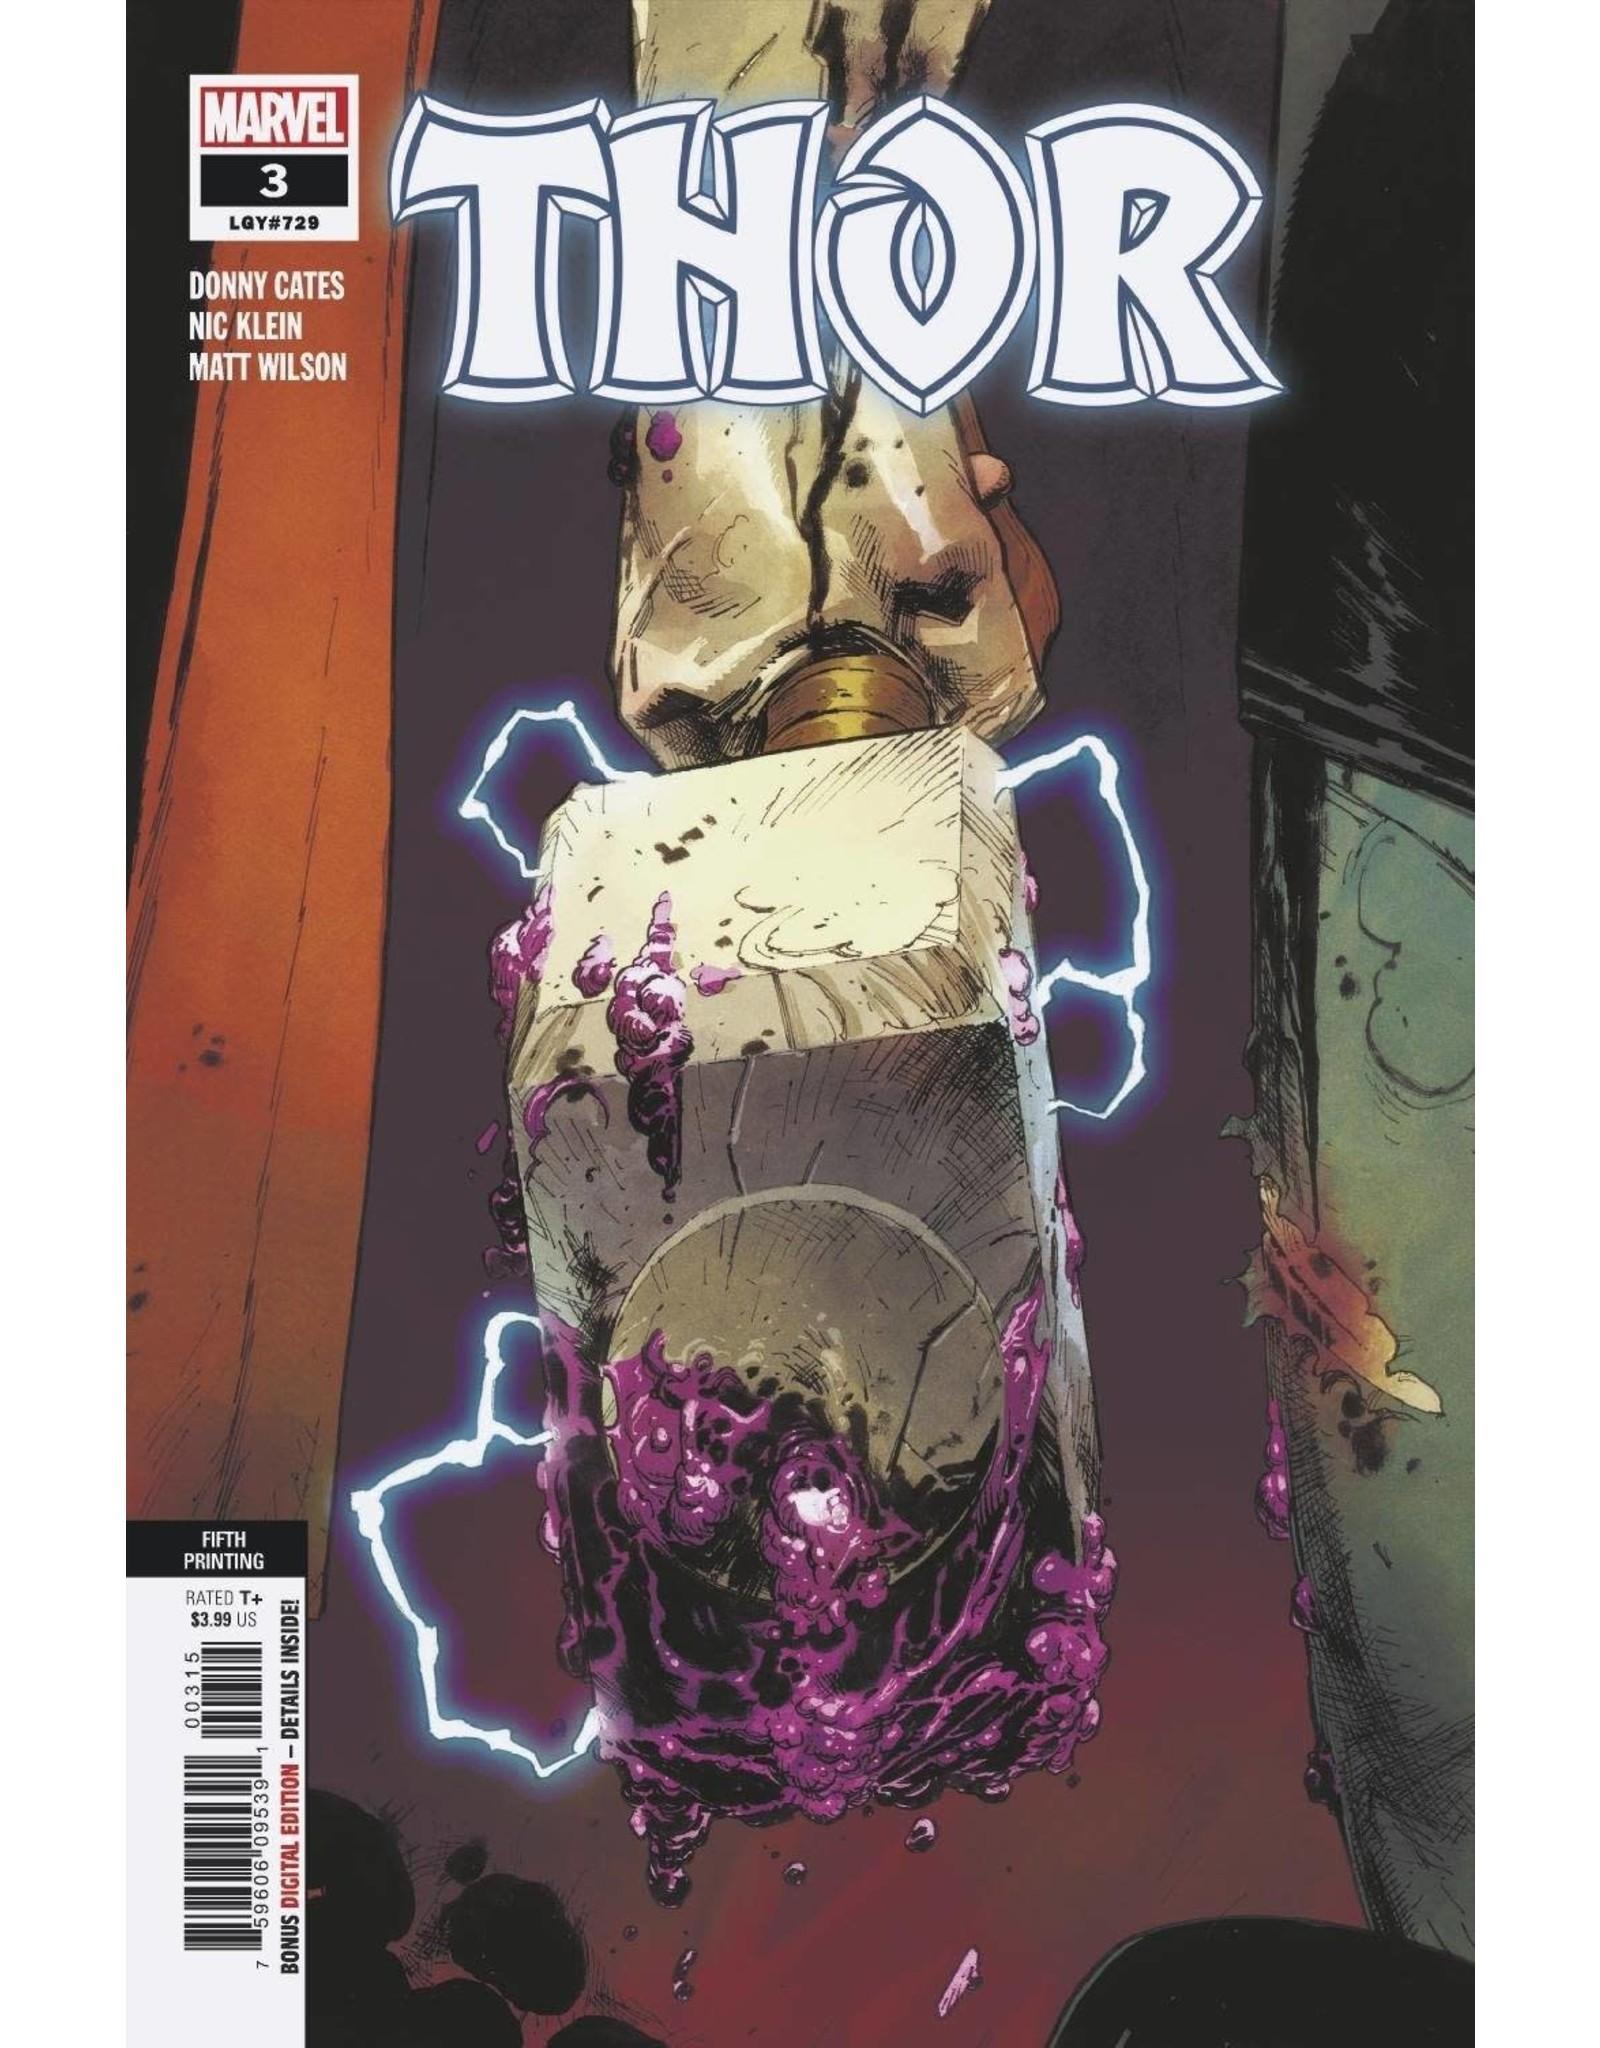 Marvel Comics THOR #3 5TH PTG VAR